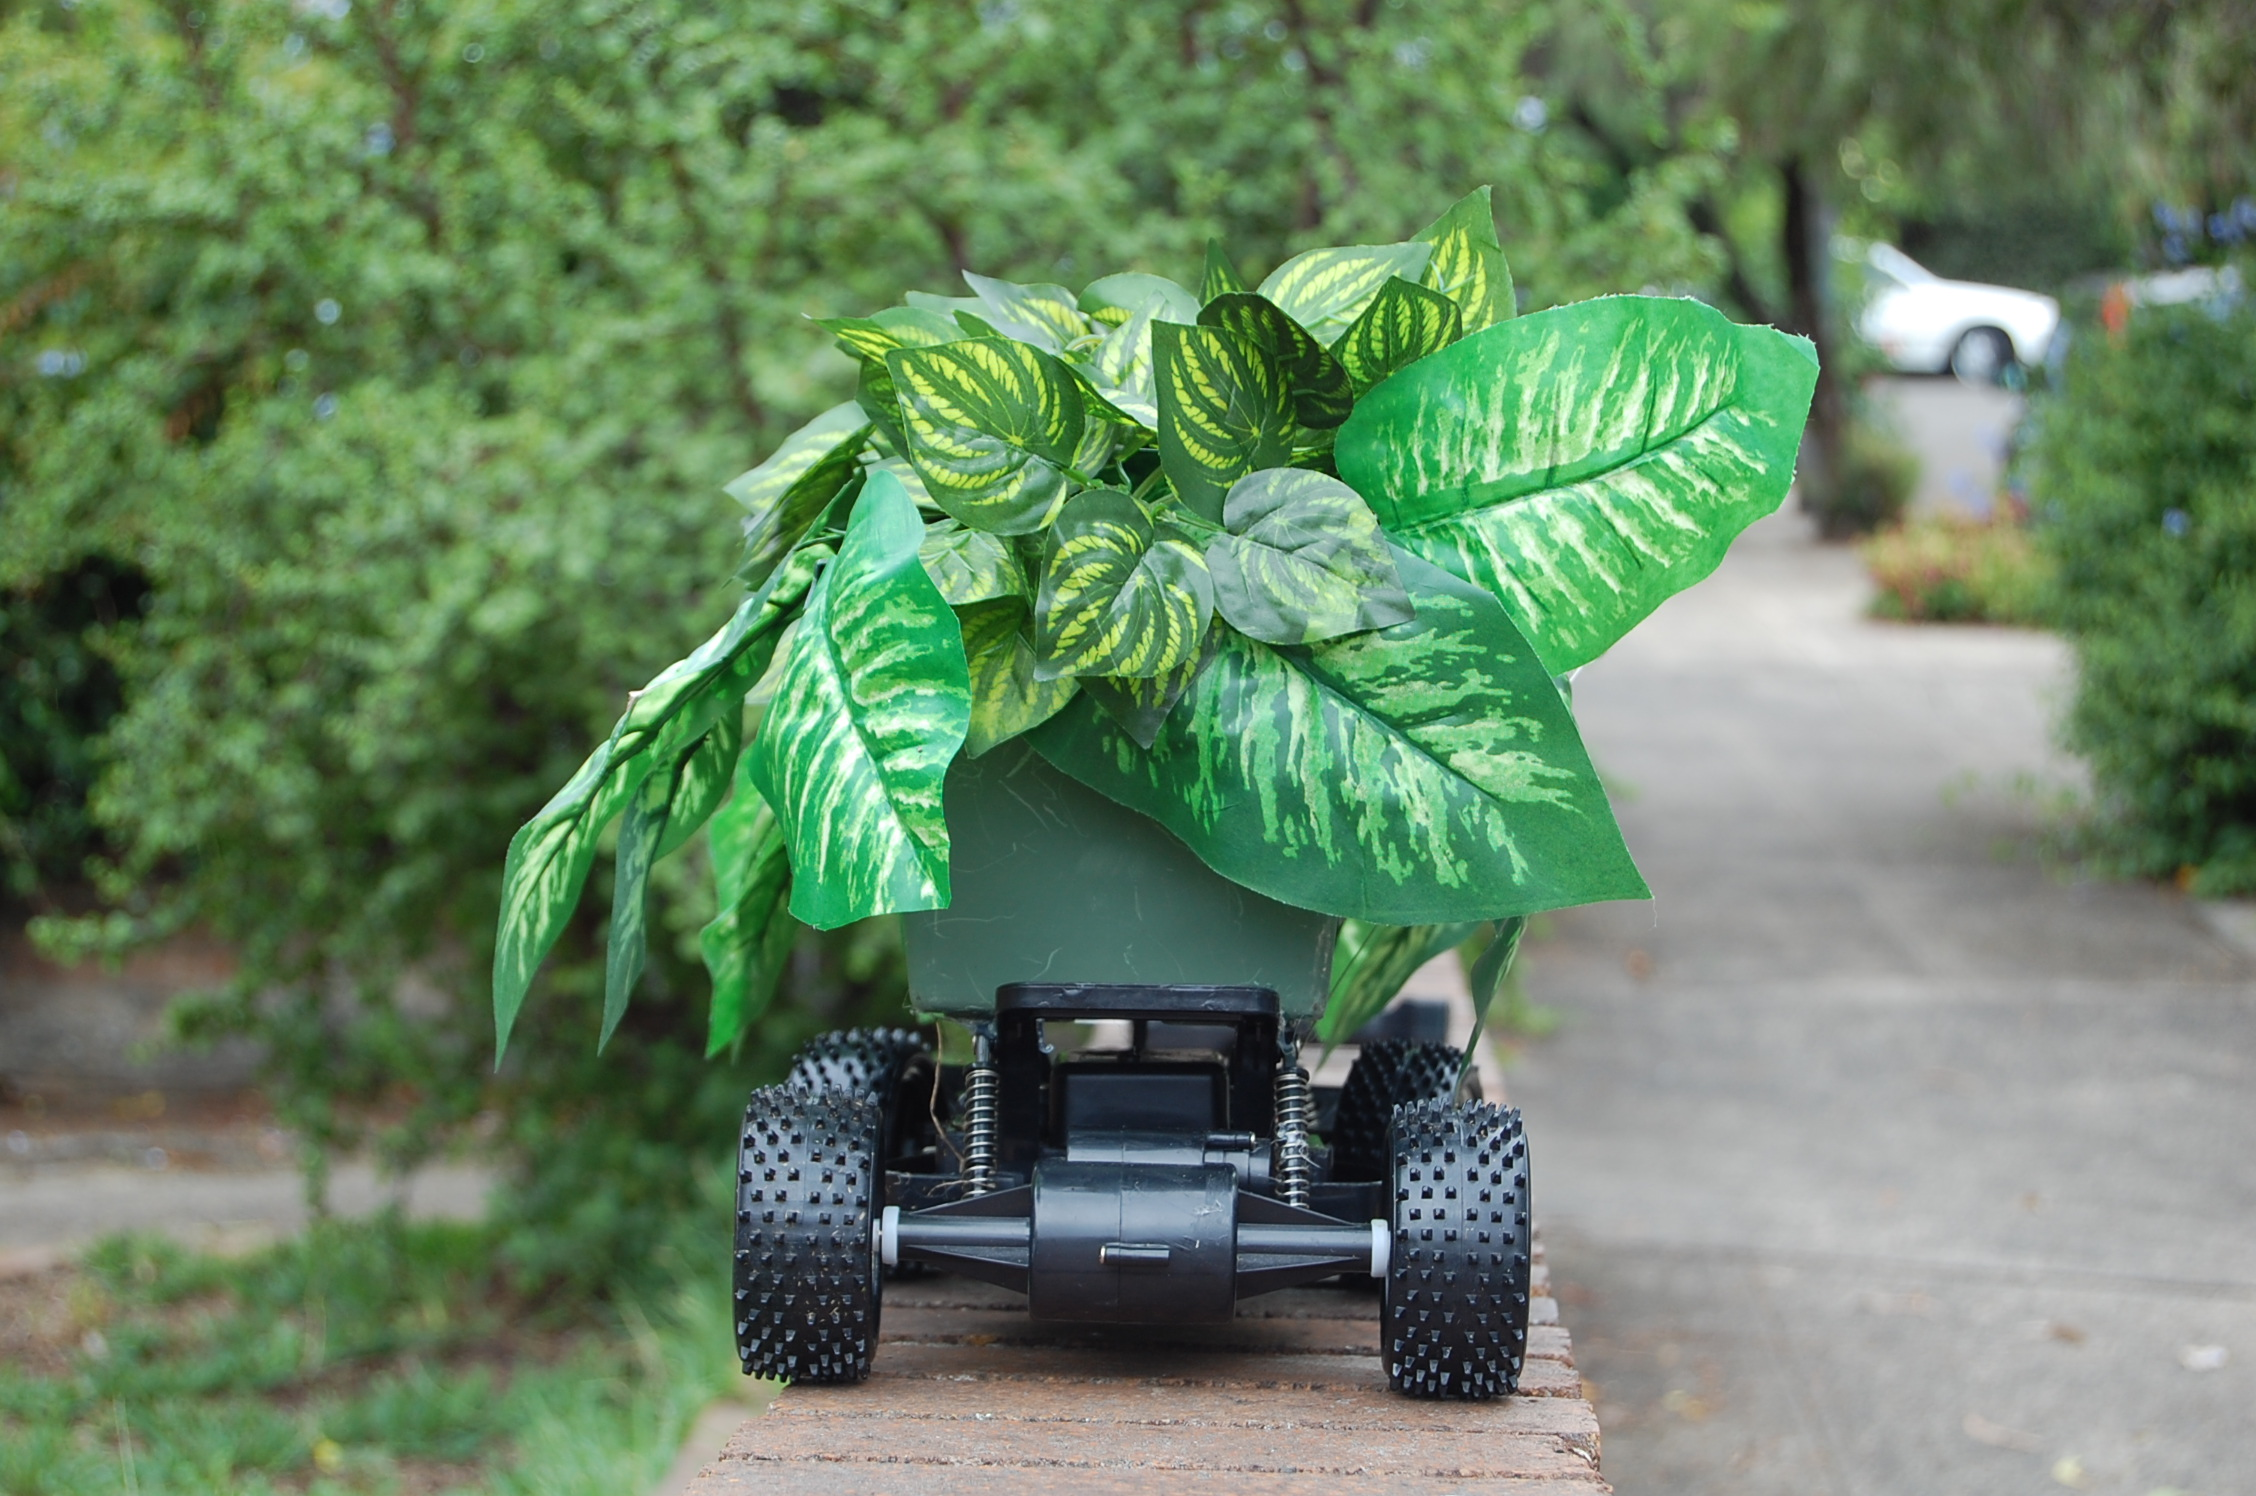 Remote Control Gardern (detail)550cm x 33cm, plastic foliage, plastic planter, RC vehicle)